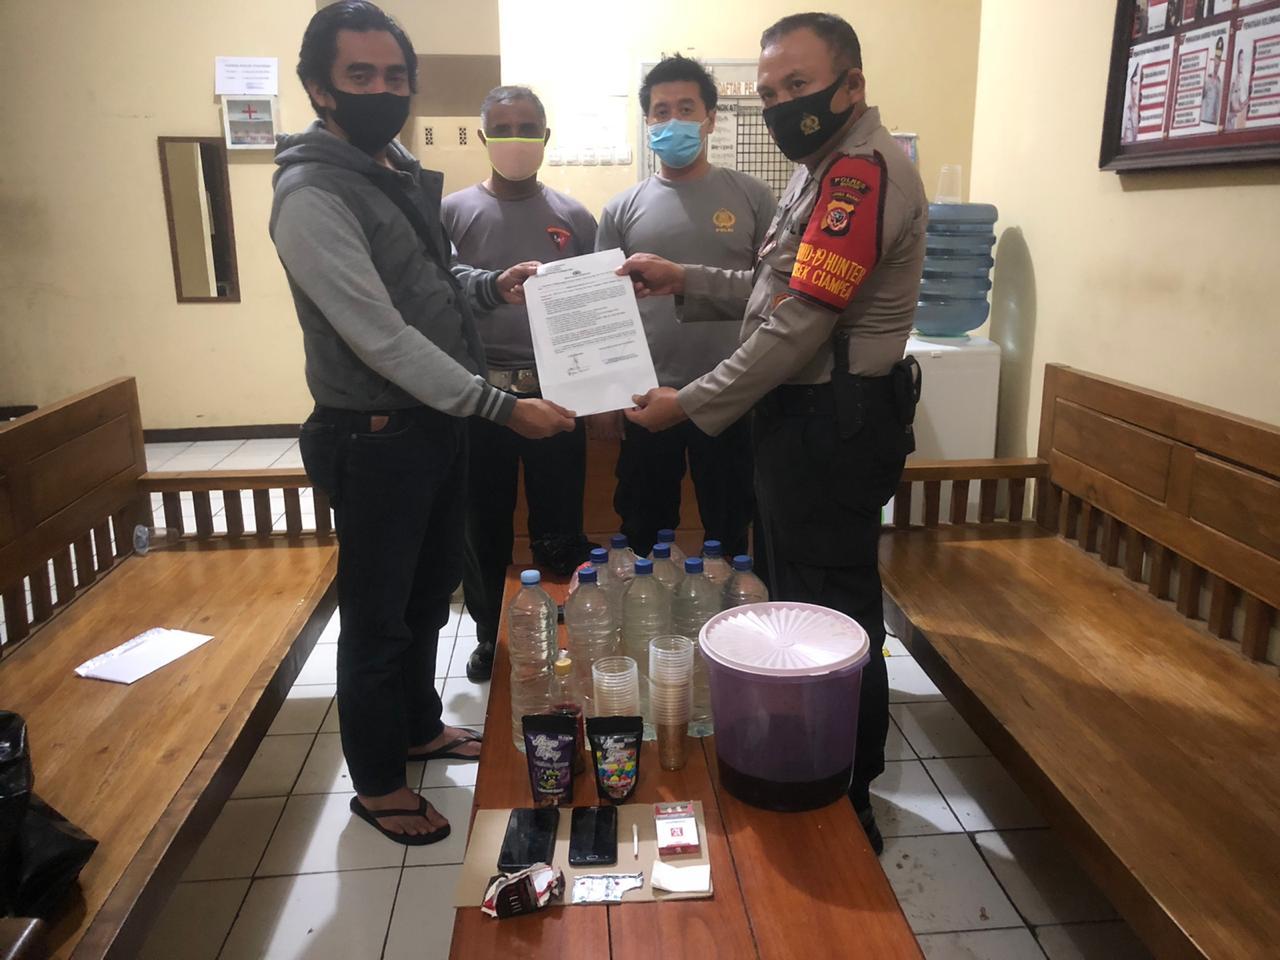 Polres Bogor Polda Jabar Gerebek 33 Muda Mudi yang Sedang Pesta Narkoba